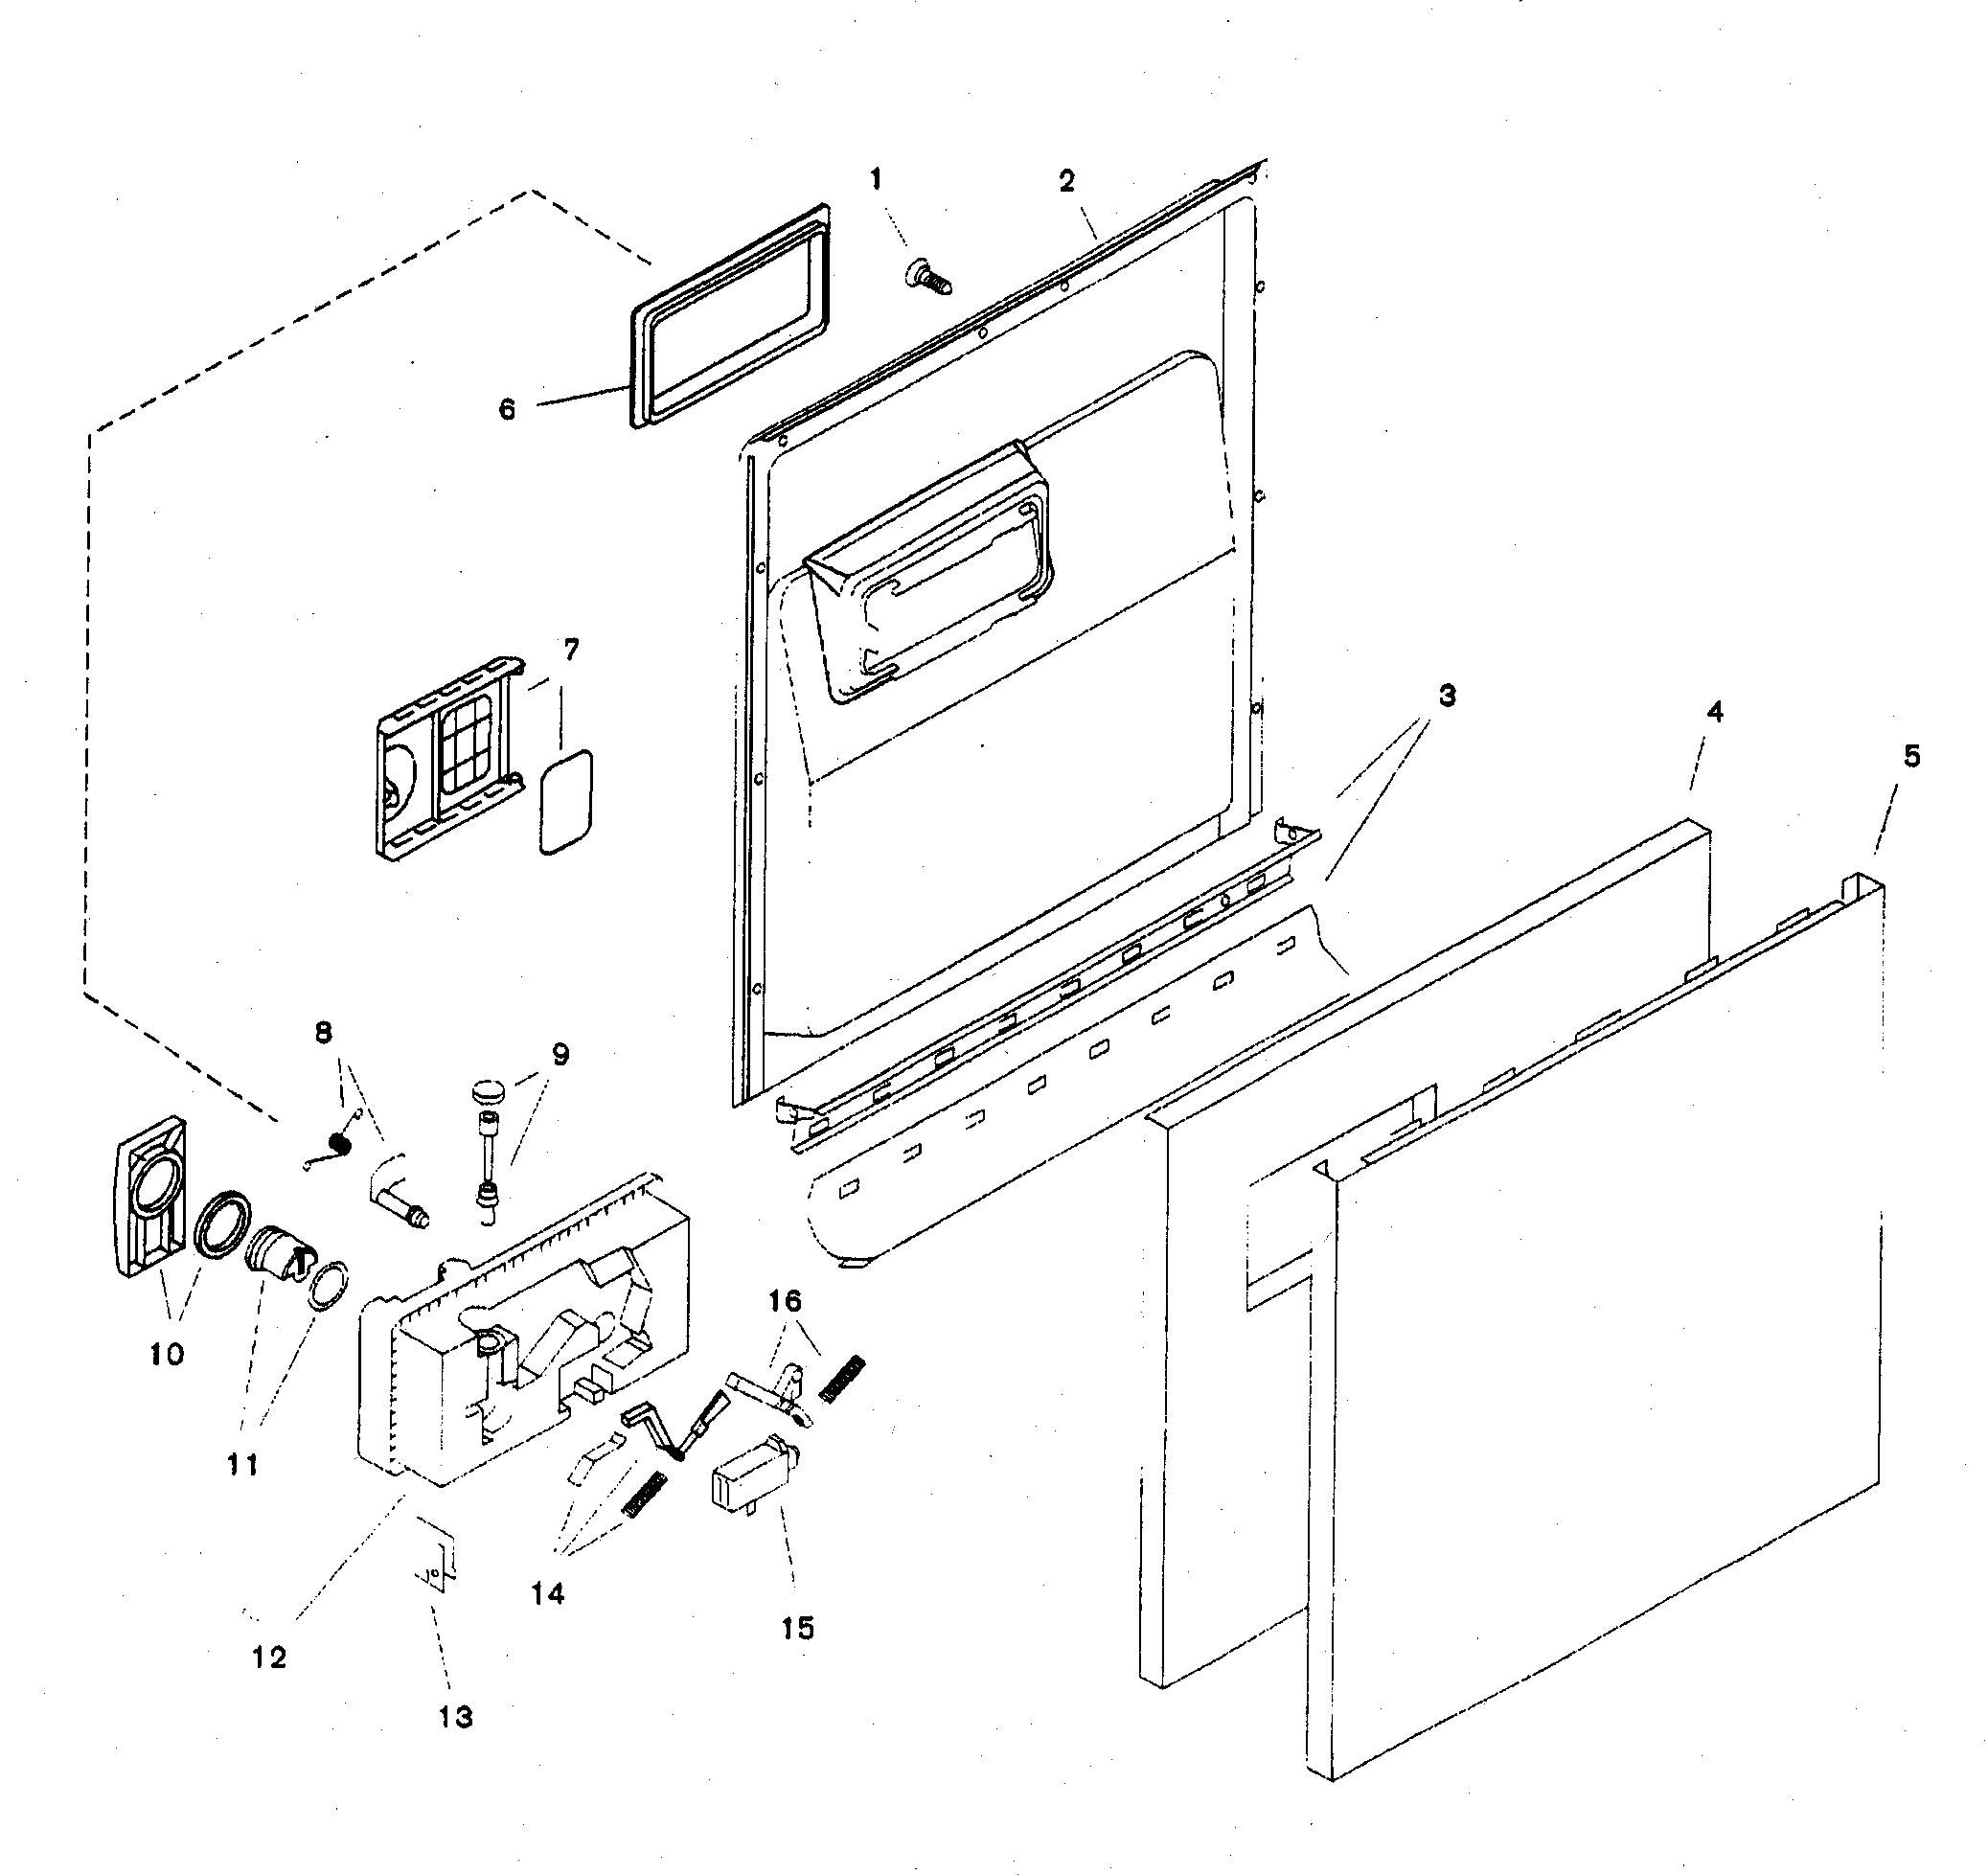 Bosch Dishwasher Parts: Bosch Dishwasher Parts List